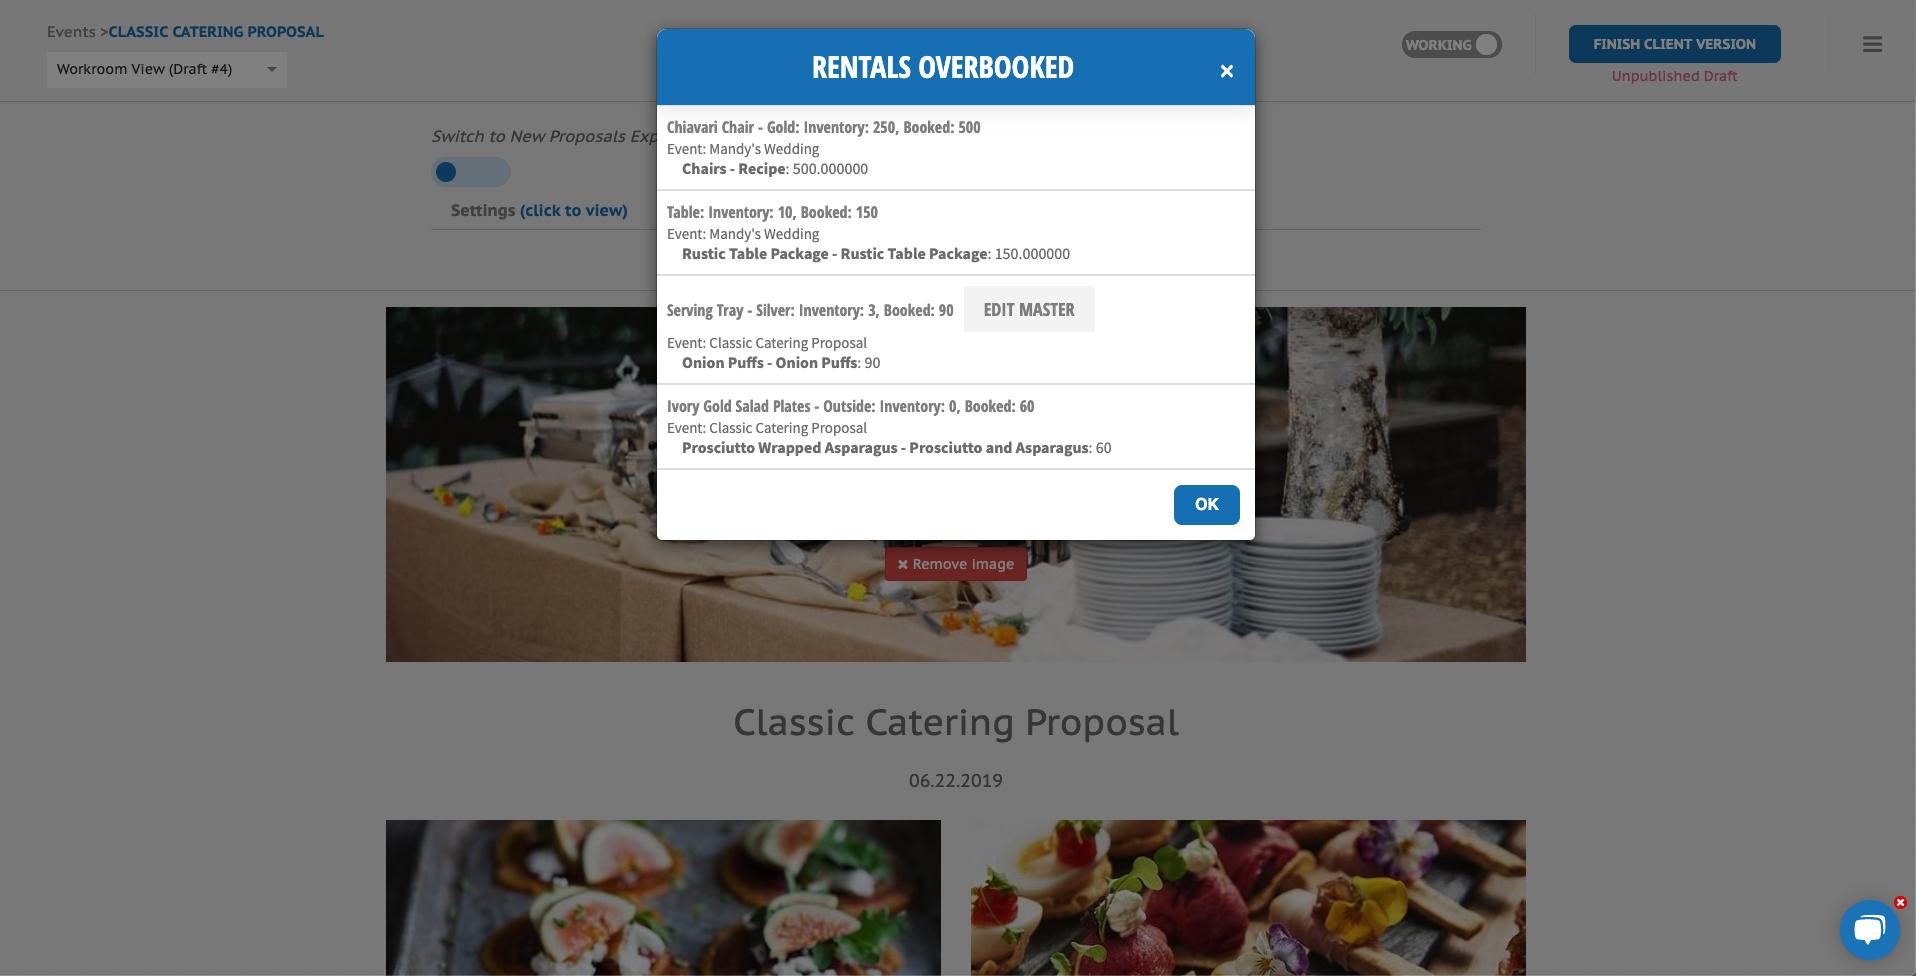 Rental Overbooked notifications